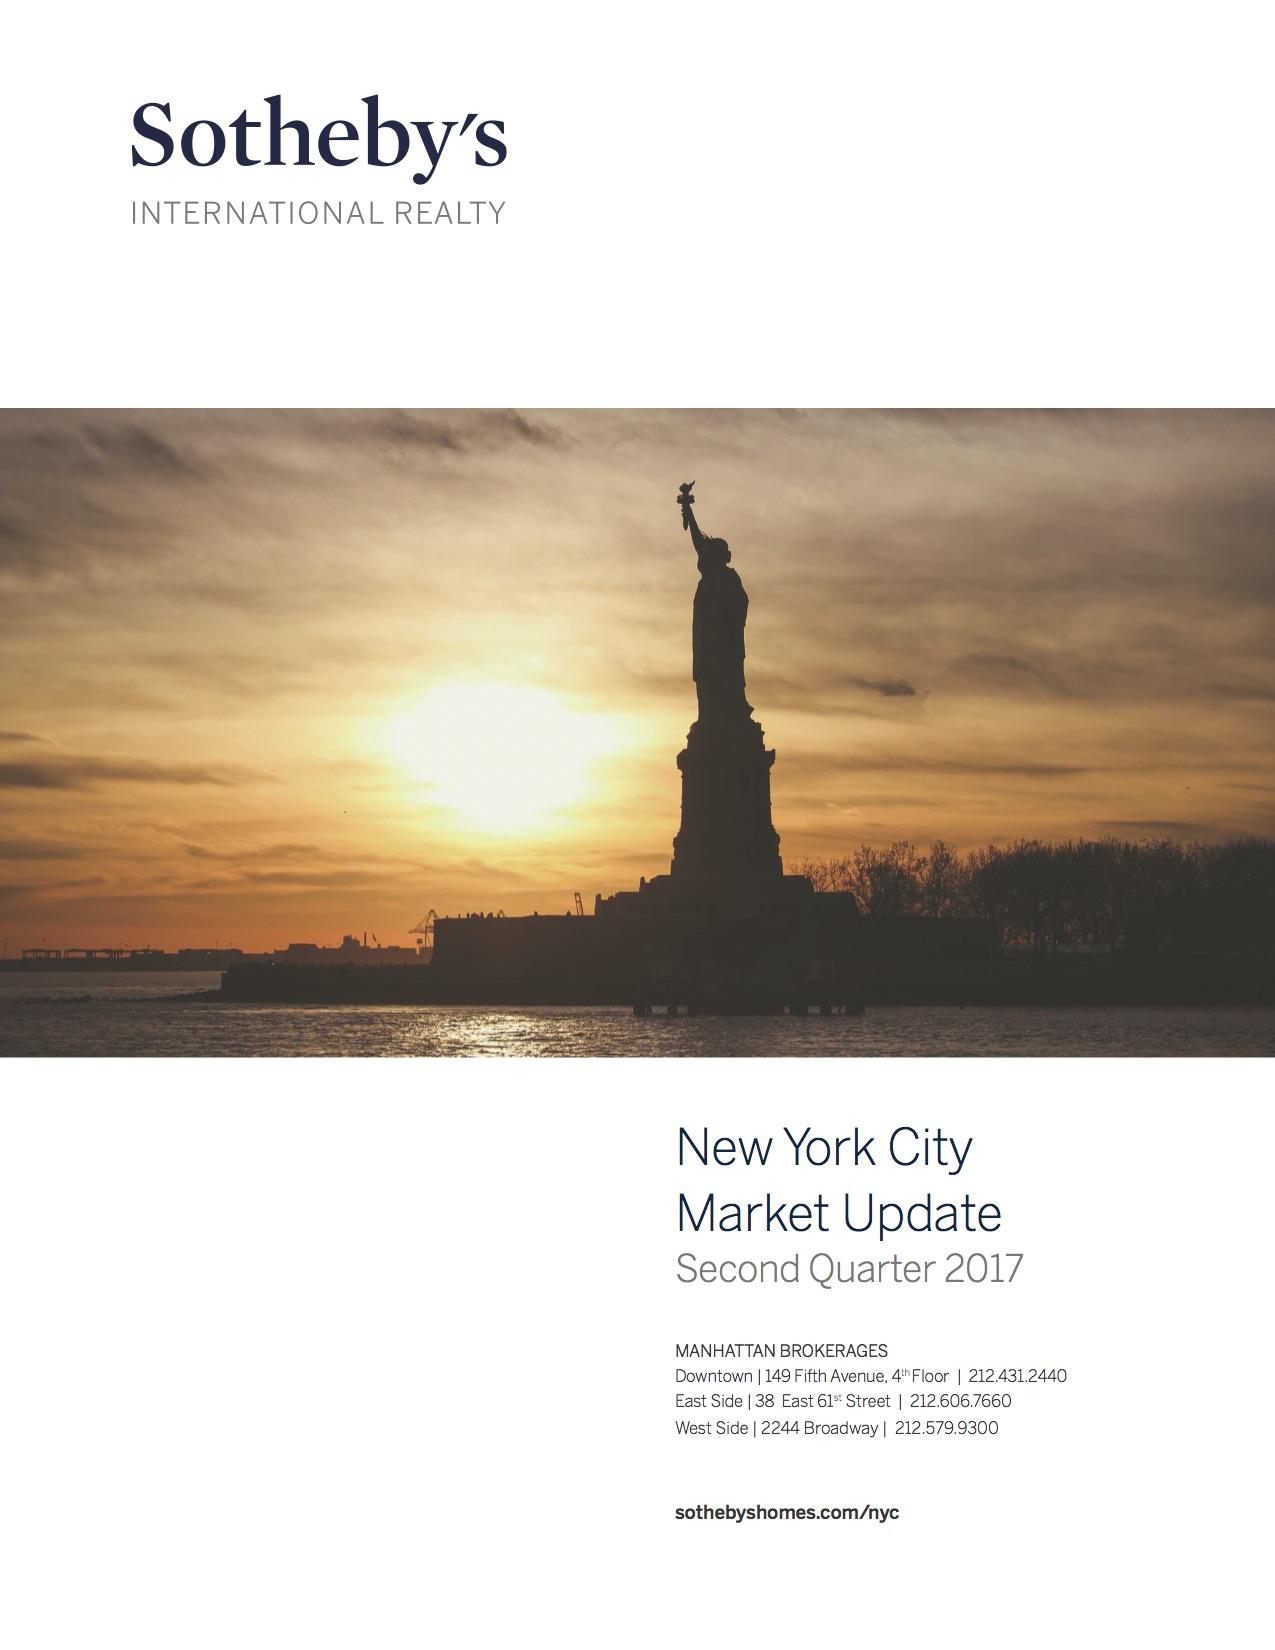 New York City Market Report - Q2 2017_1.jpg